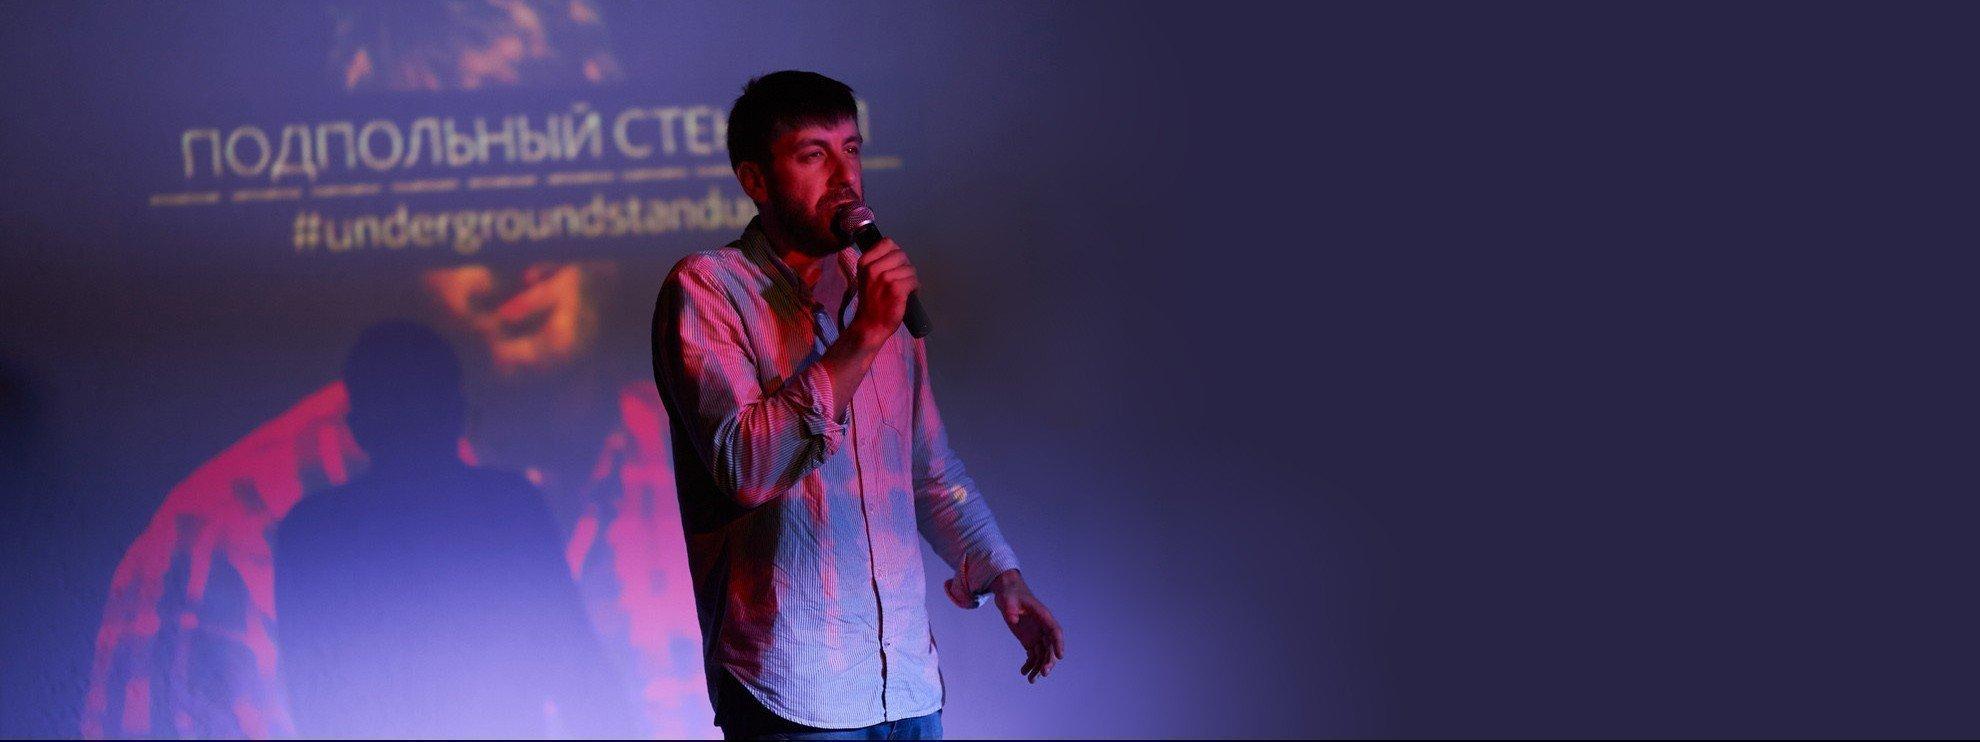 performer Подпольный Стендап / Underground Stand Up